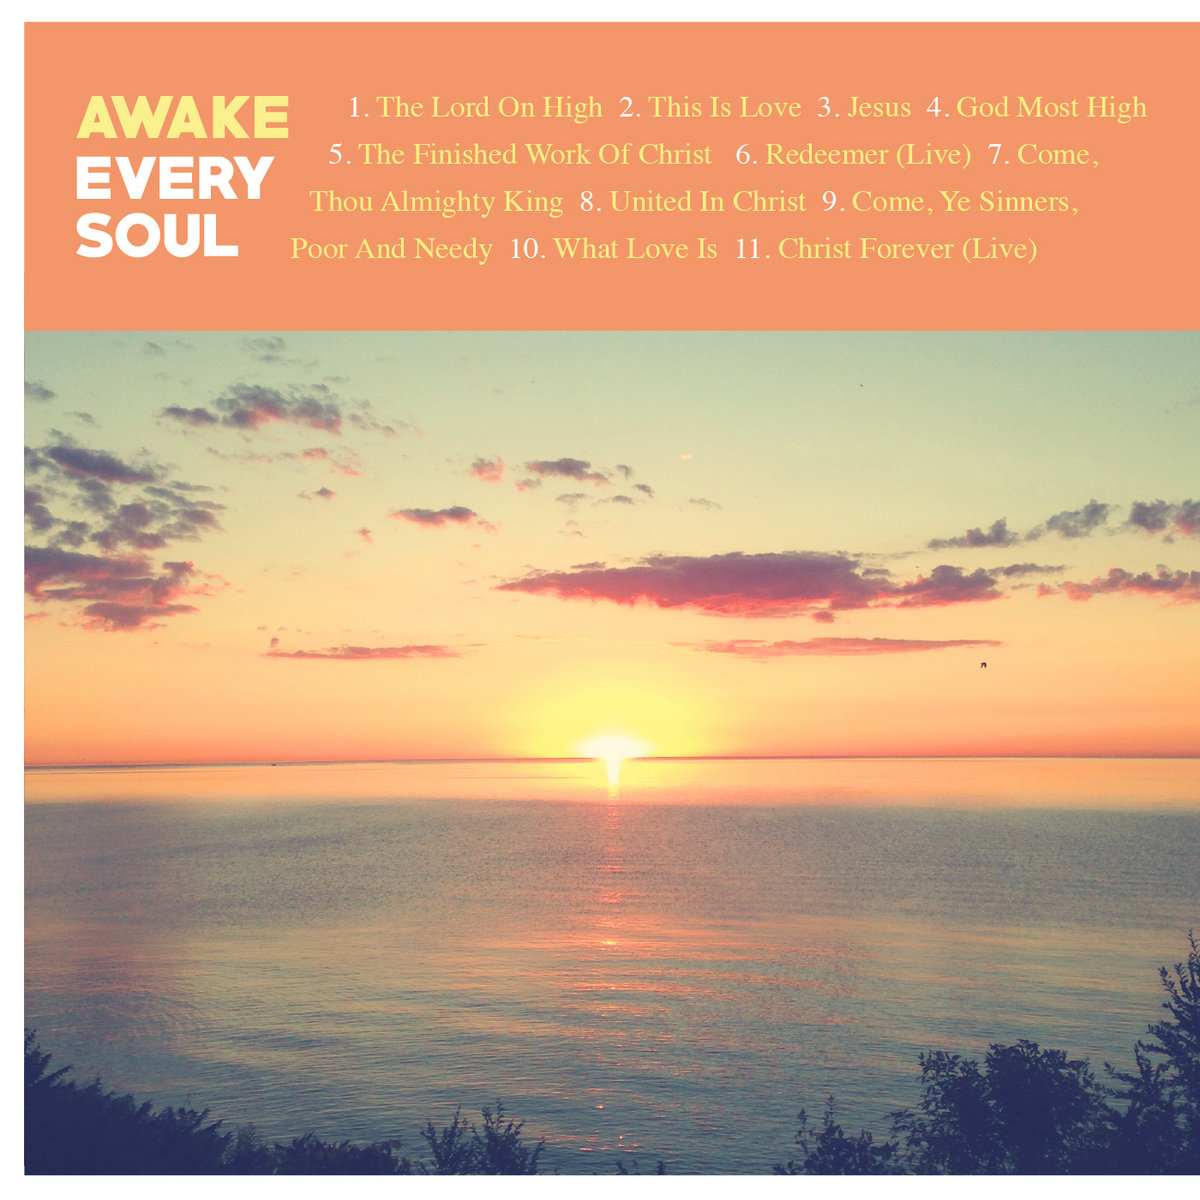 Awake Every Soul | Grace Church Songs